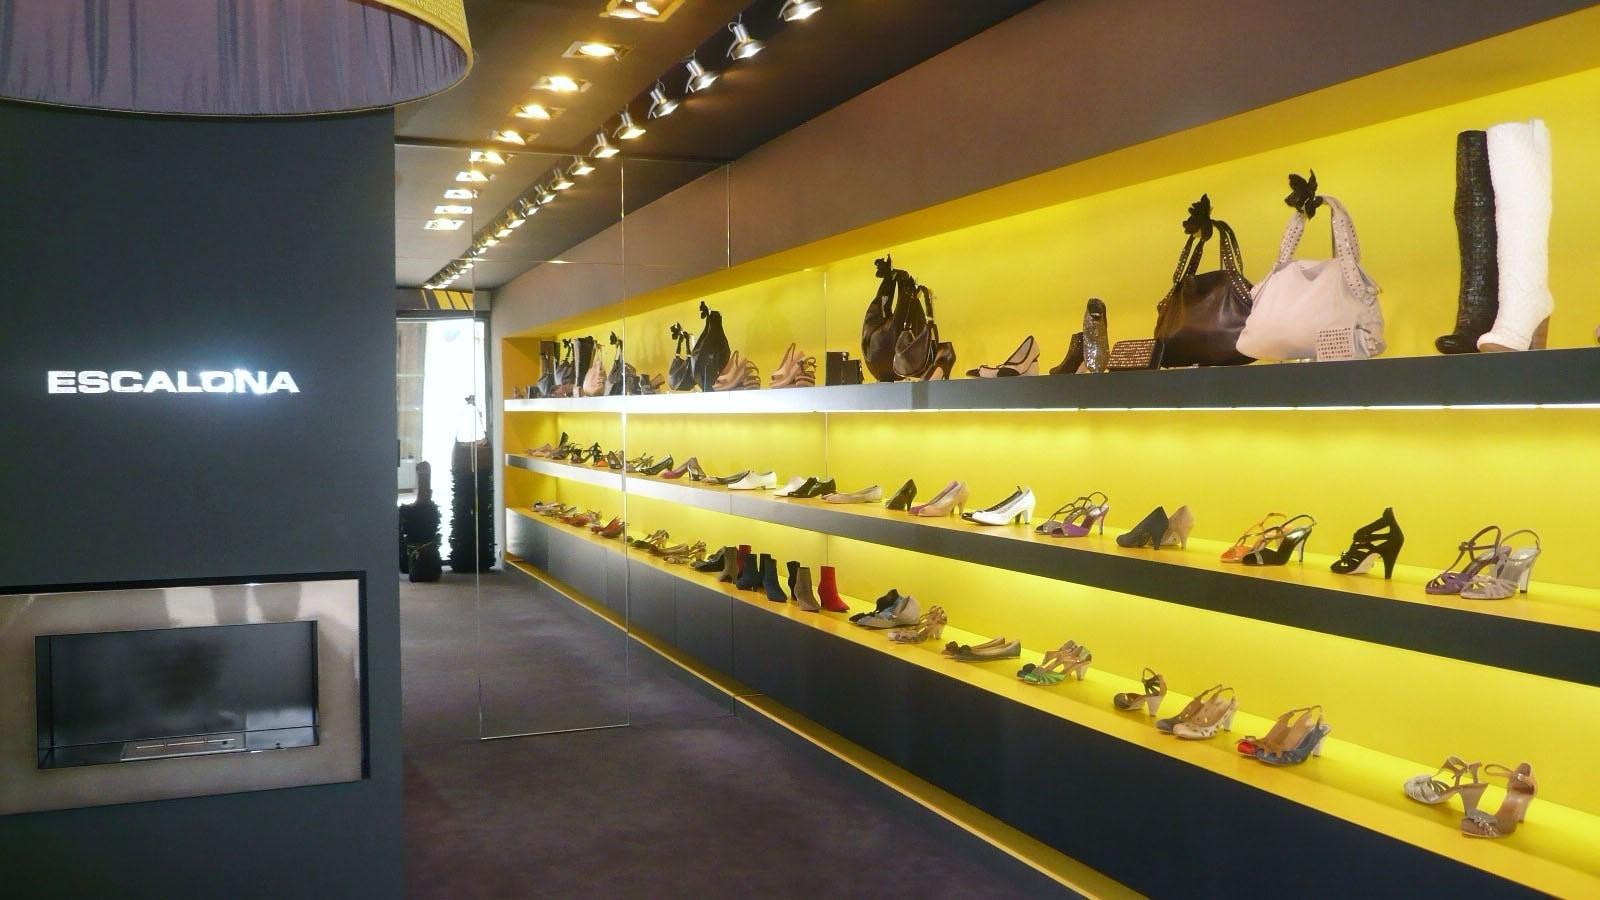 Boutique Escalona Paris Efi Design (4)